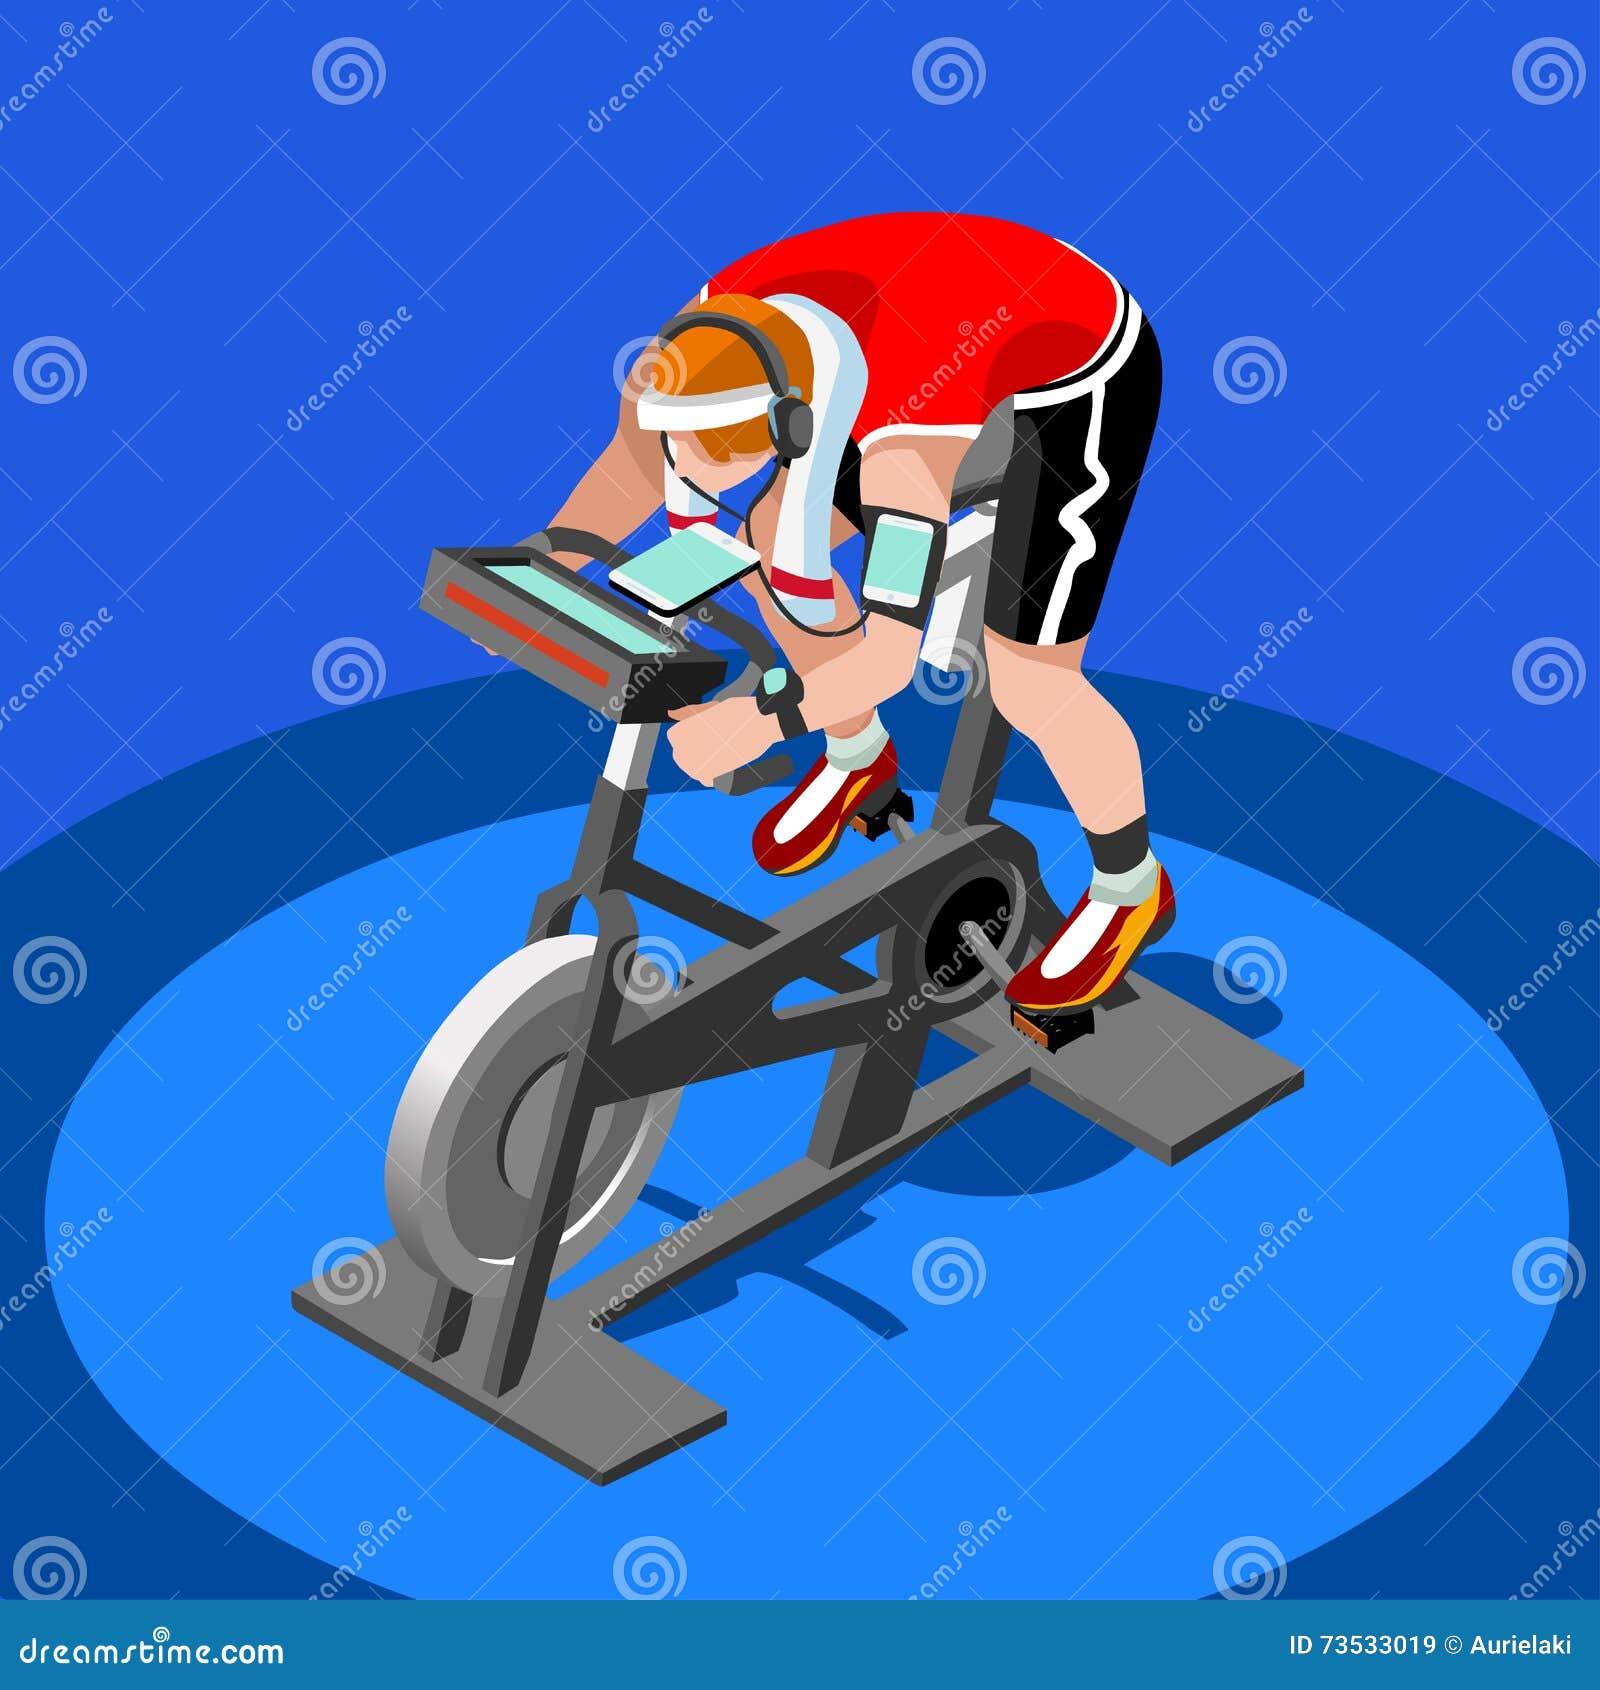 Classe di filatura di forma fisica della bici di esercizio bici di filatura pianamente isometrica di forma fisica 3D